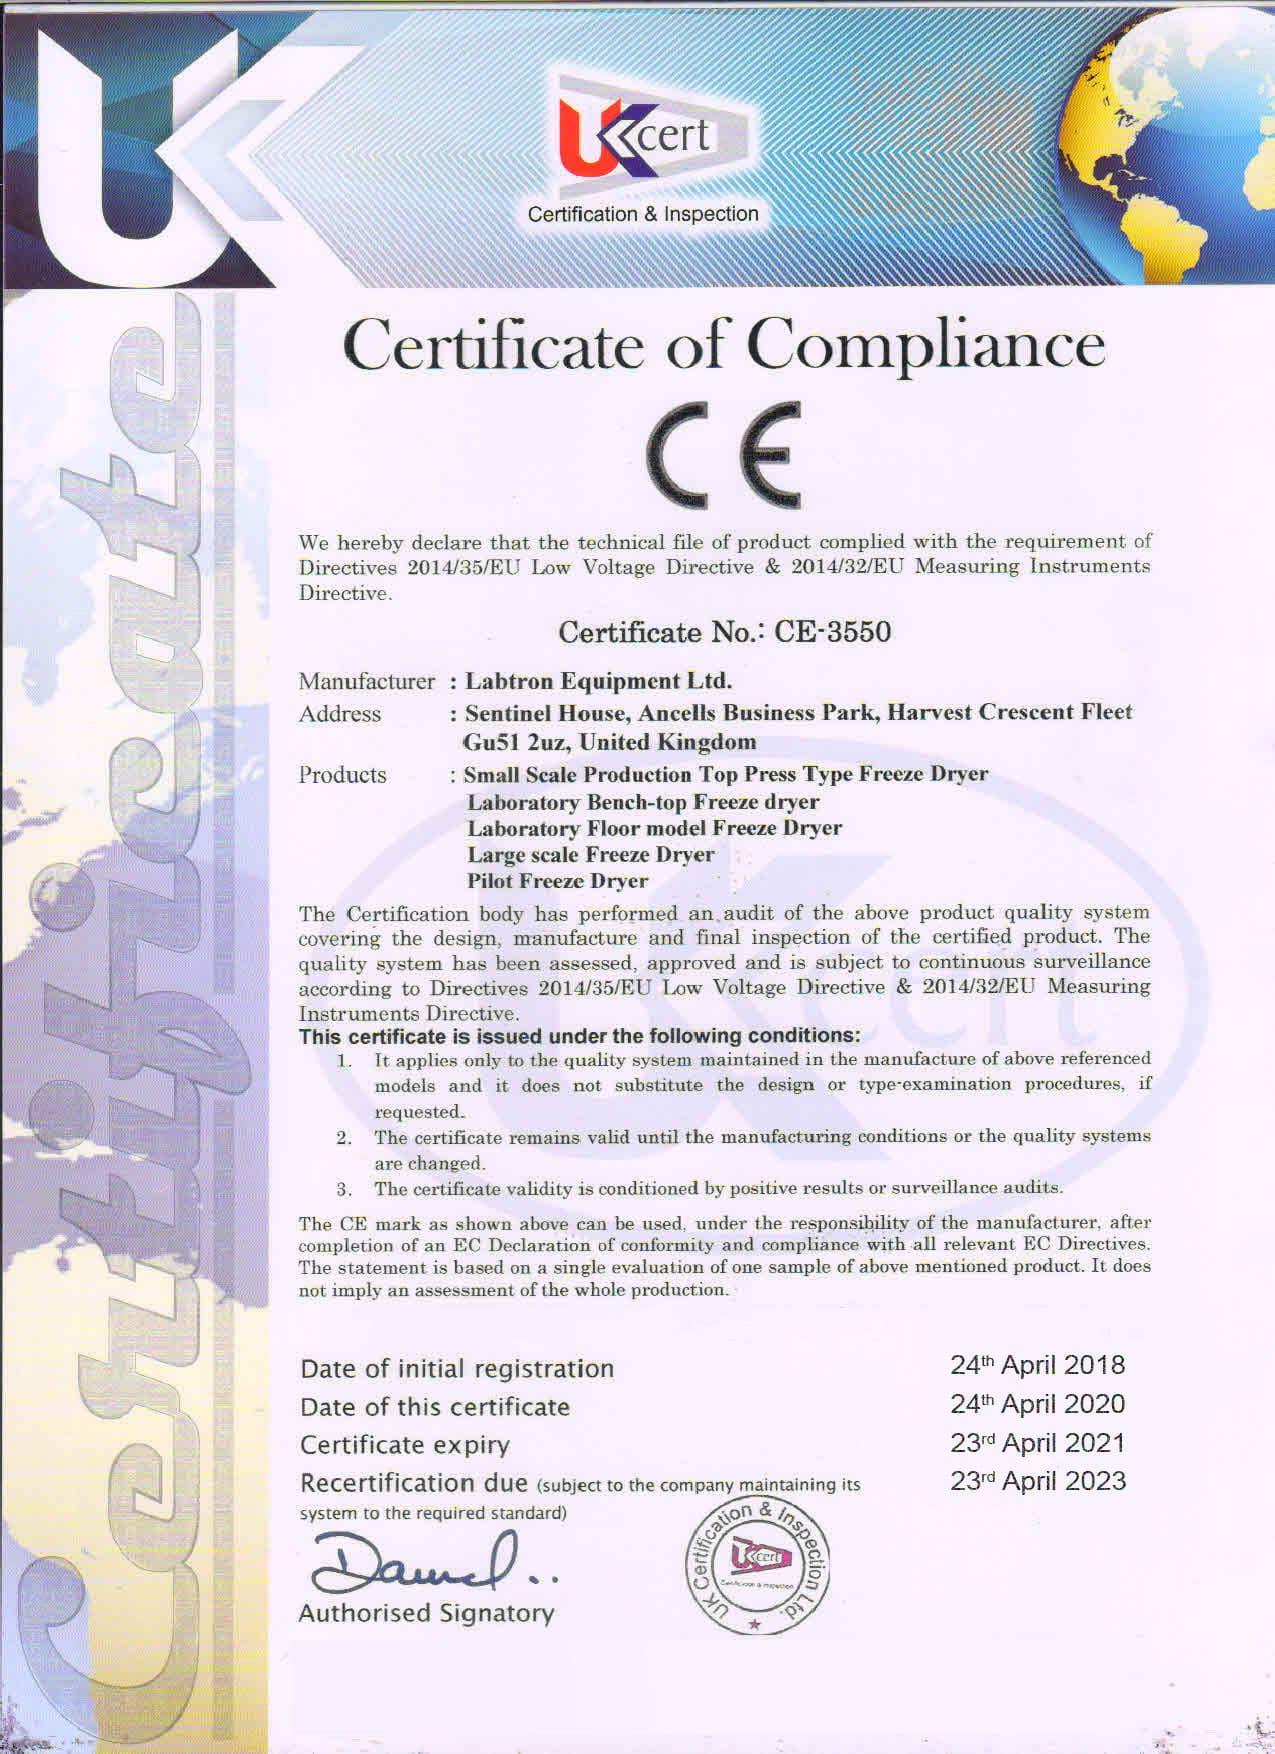 Labtron Equipment Ltd. >Certificate of Compliance CE-3550 : Labtron Certification